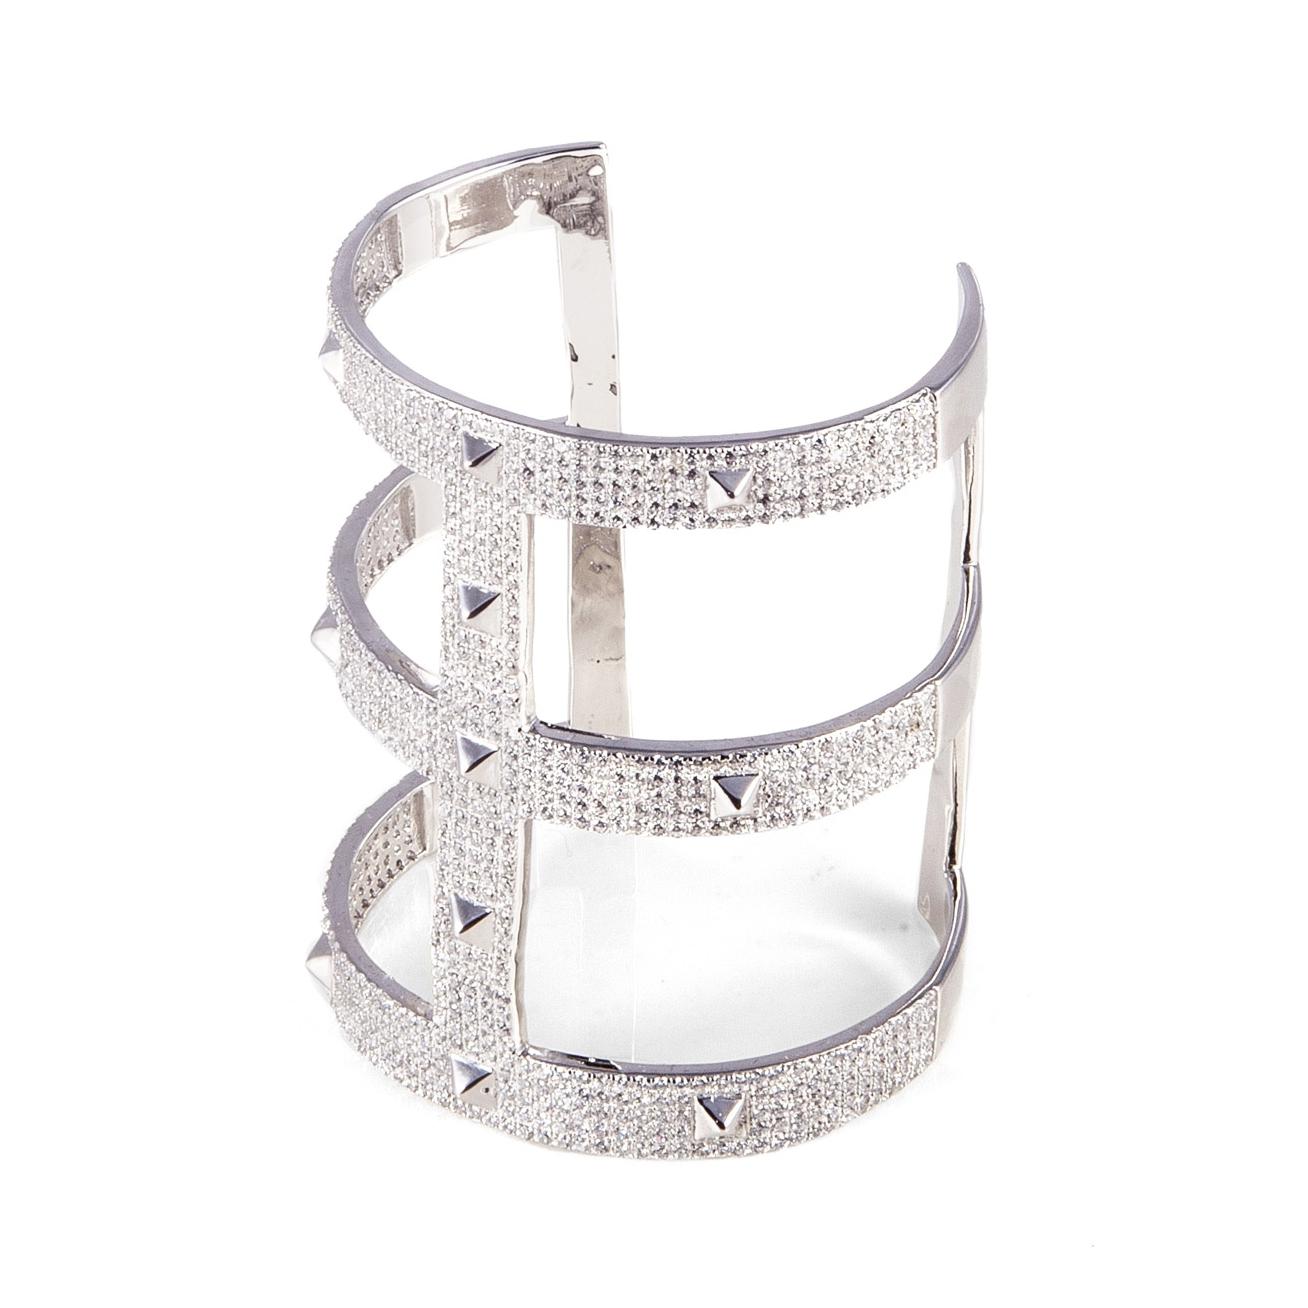 White silver cuff bracelet